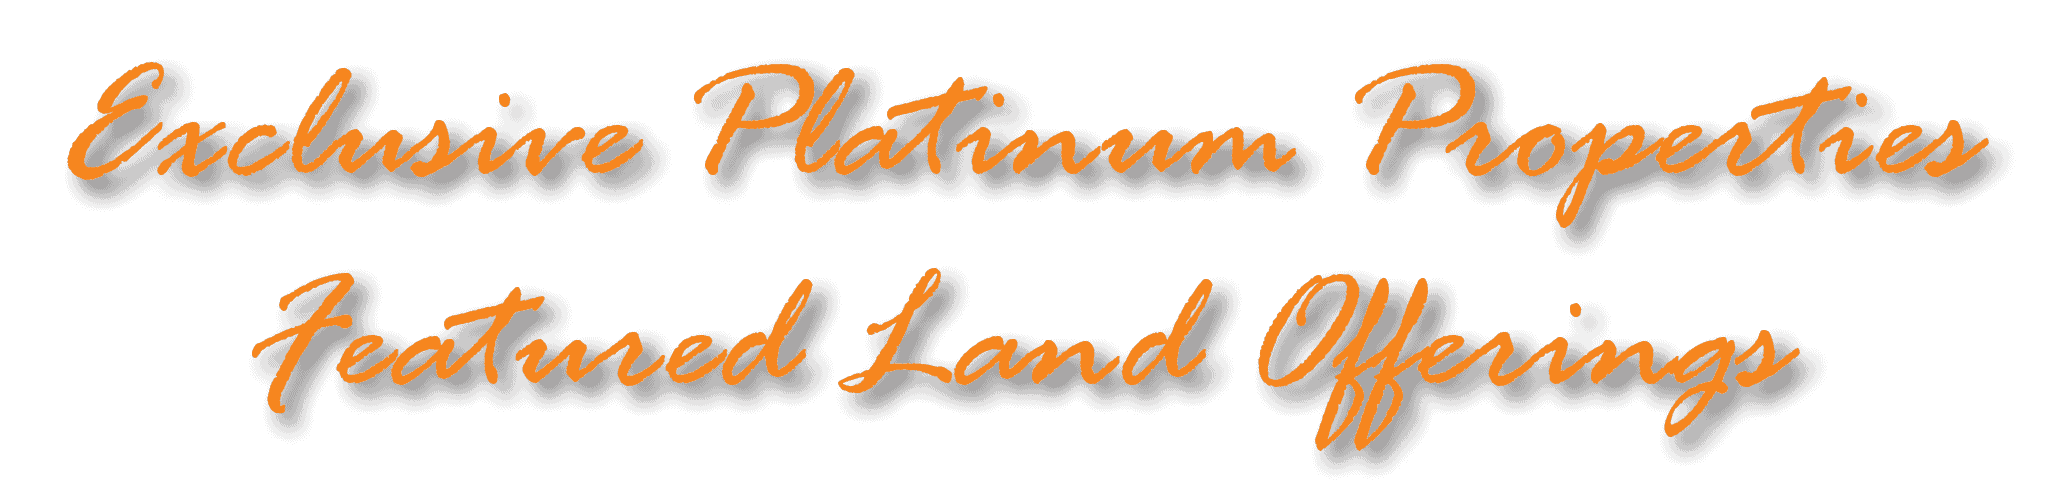 Schlauch Uhlmann Platinum Properties Bozeman Luxury Real Estate Land Offerings